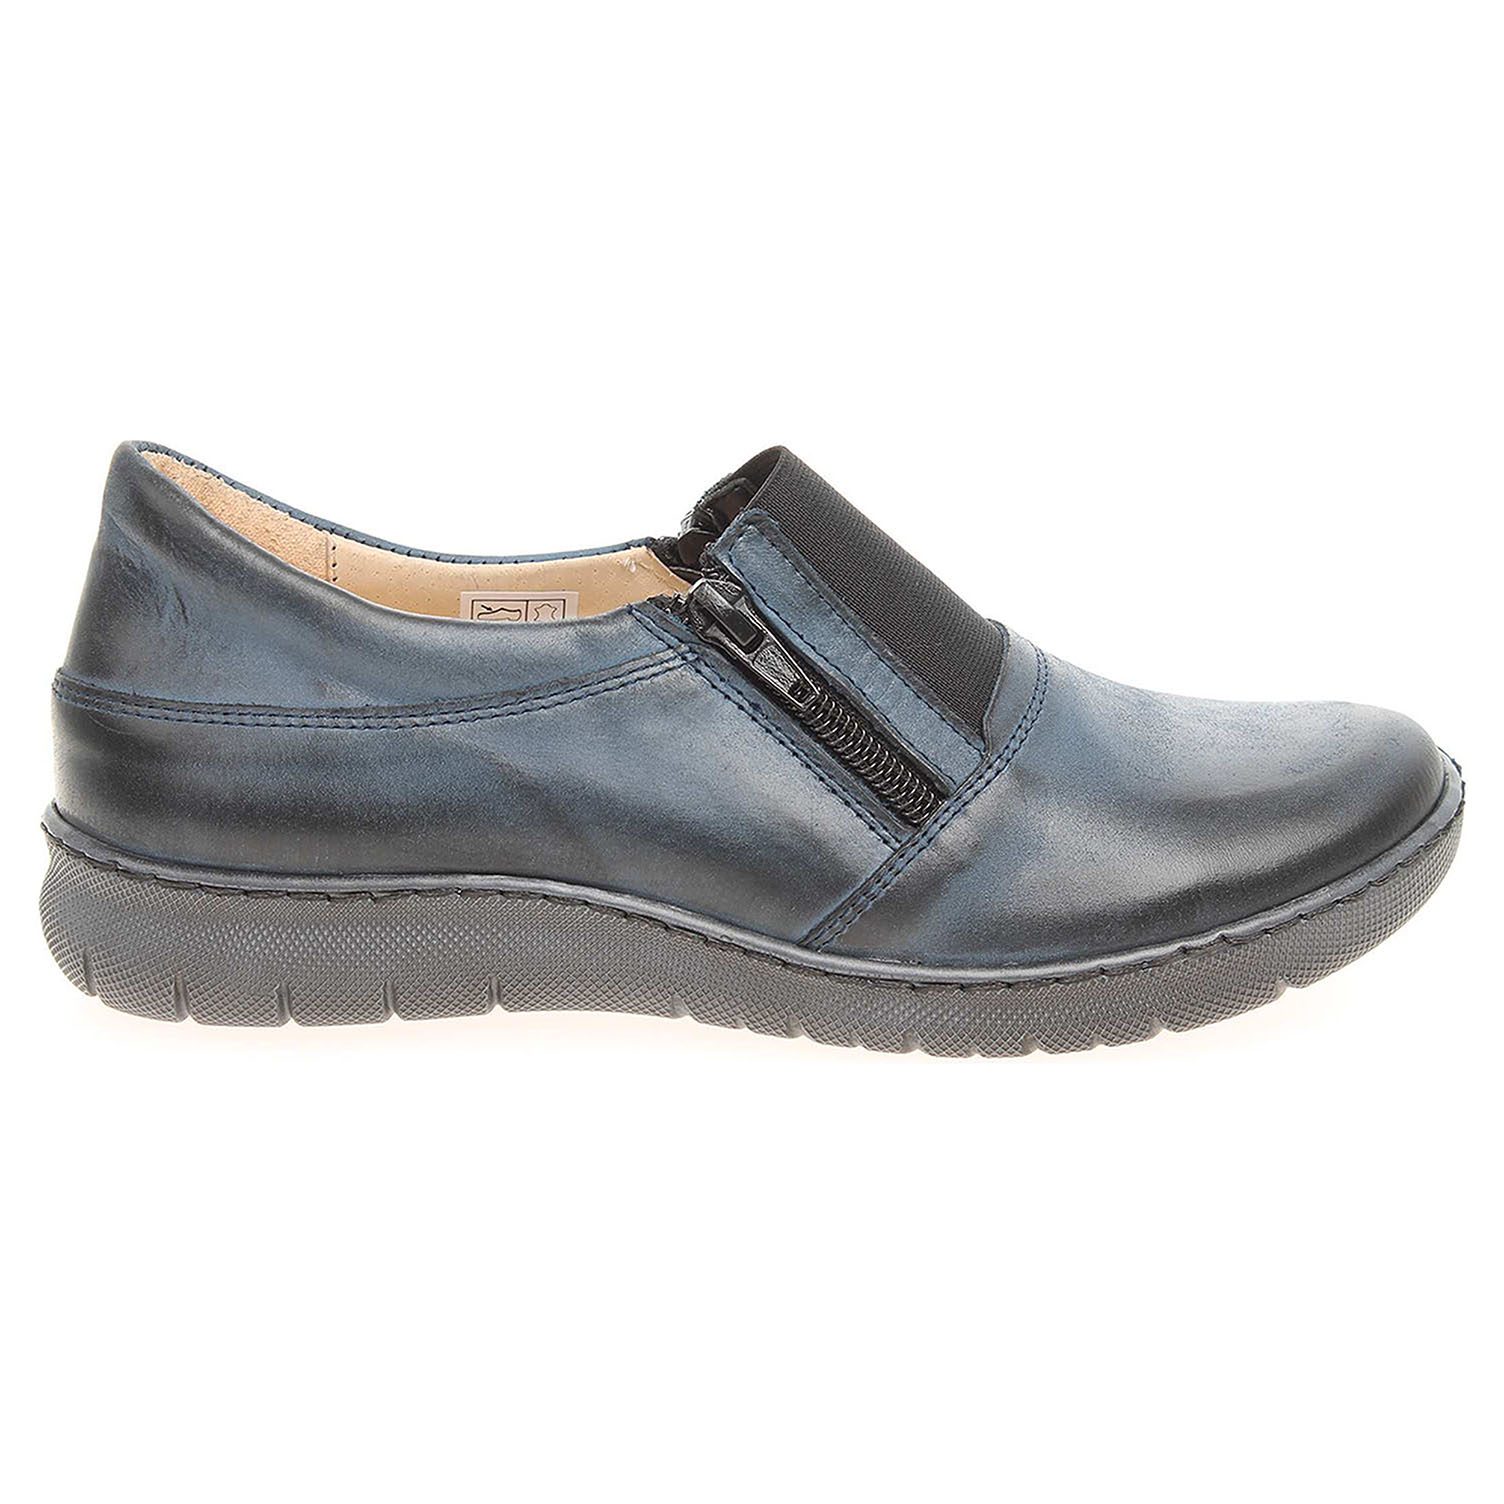 Dámská obuv PIN59 modrá PIN59 ferro 41